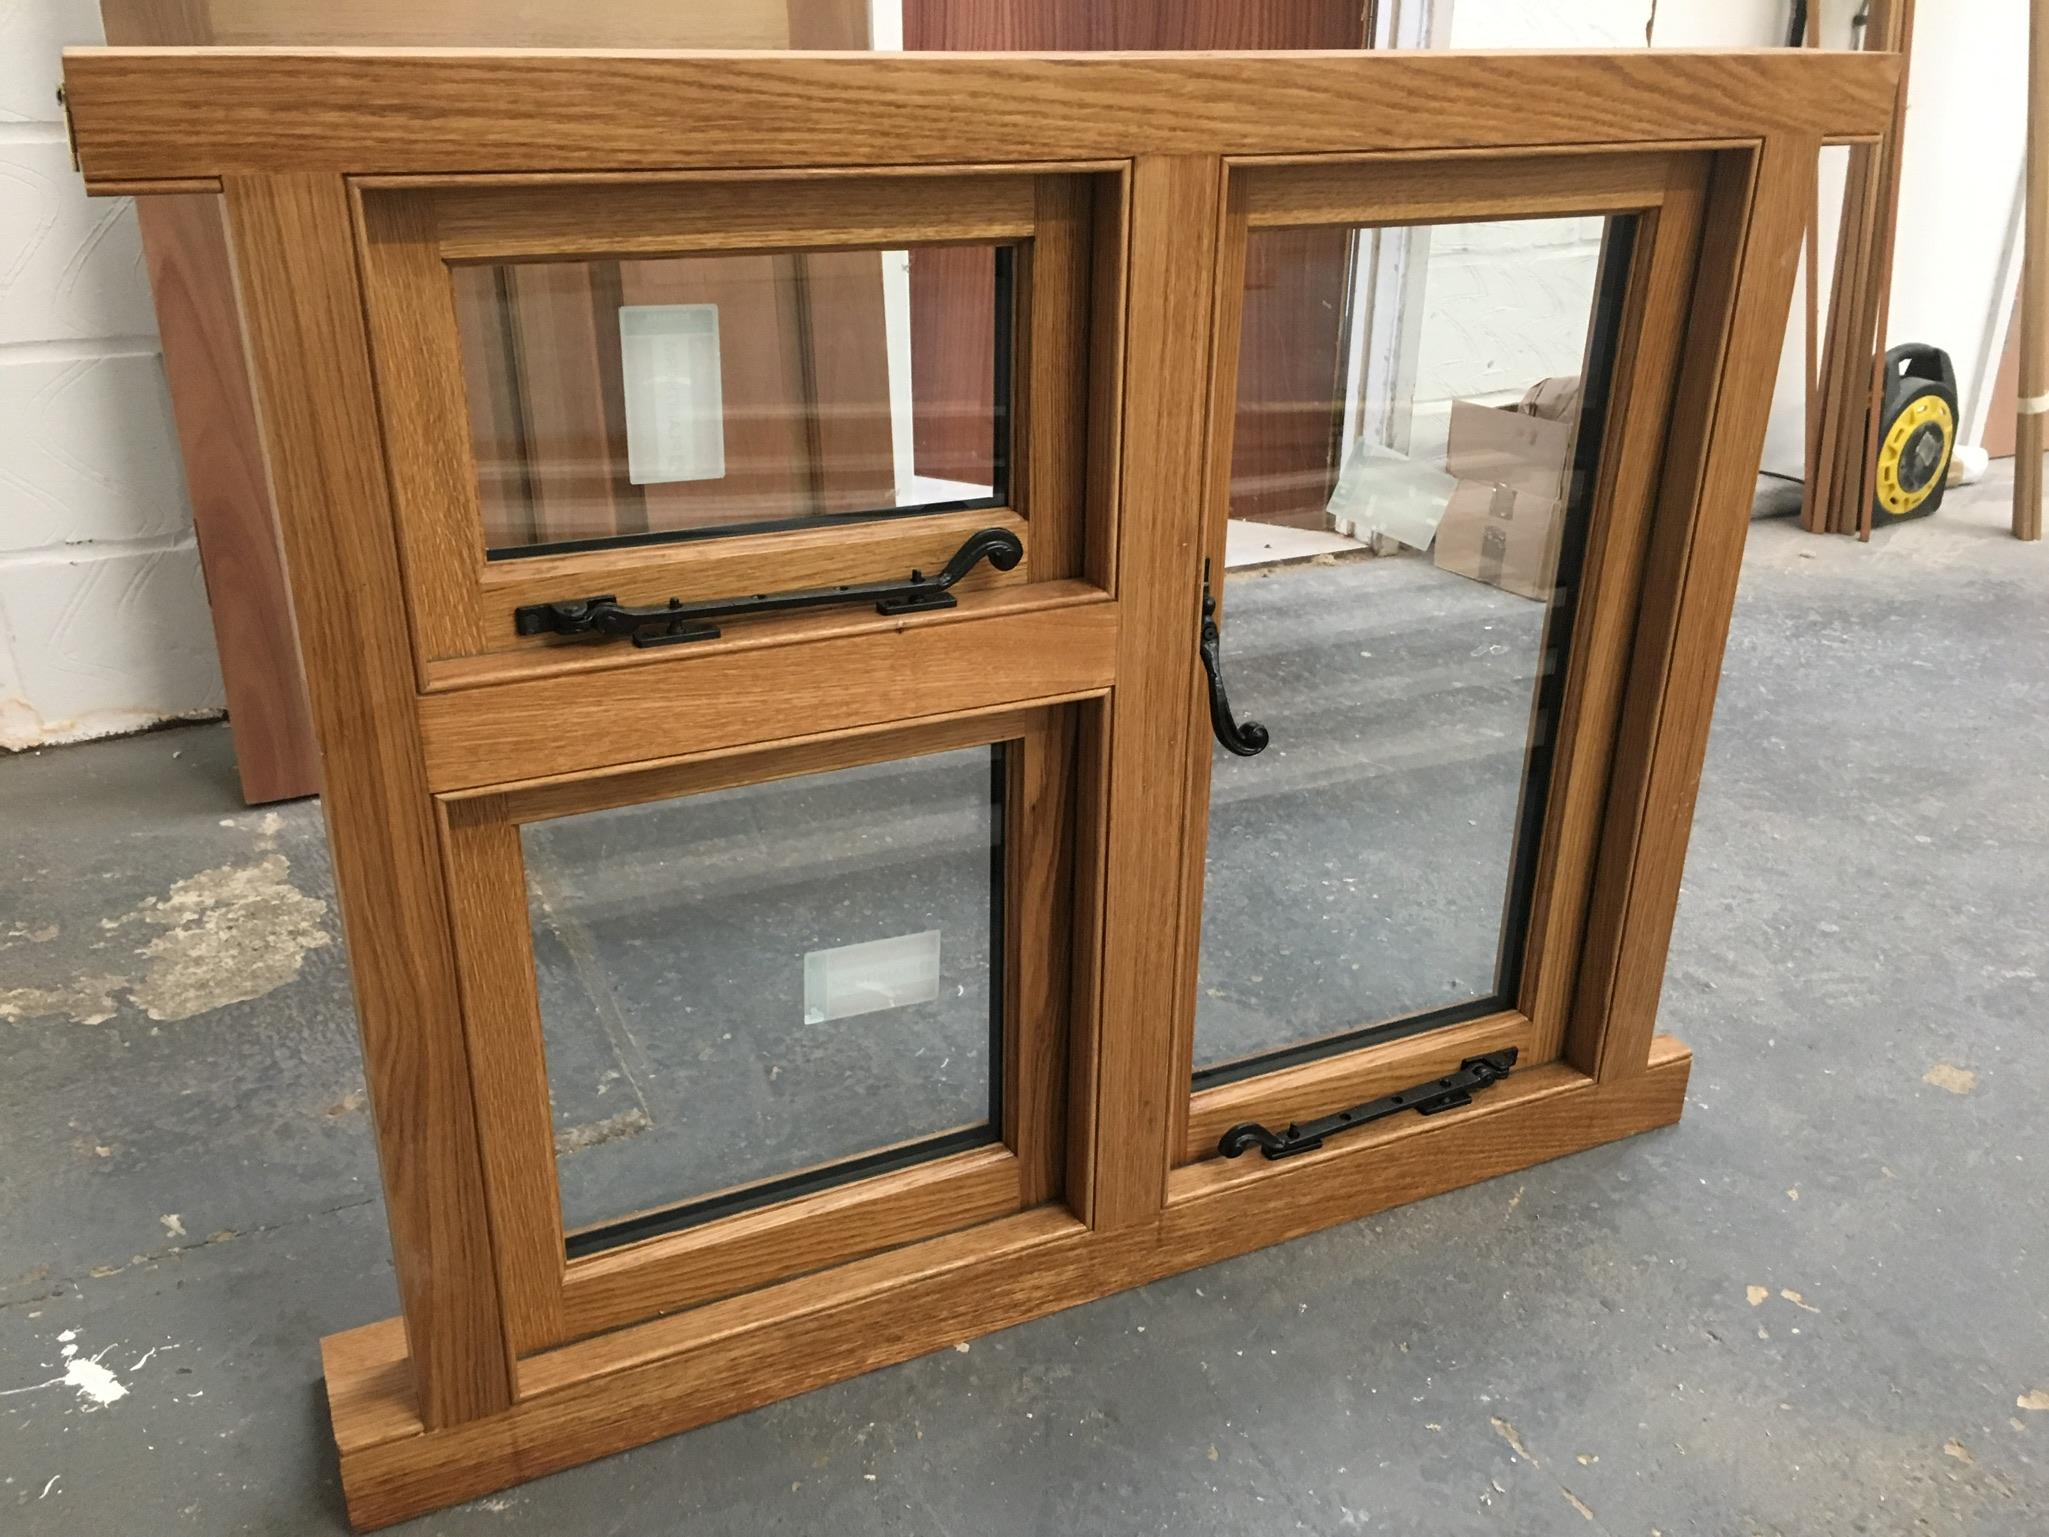 Windows - Joiners Sudbury Suffolk - Precision Made Joinery & Window Bespoke Design and Build Sudbury Suffolk East Anglia